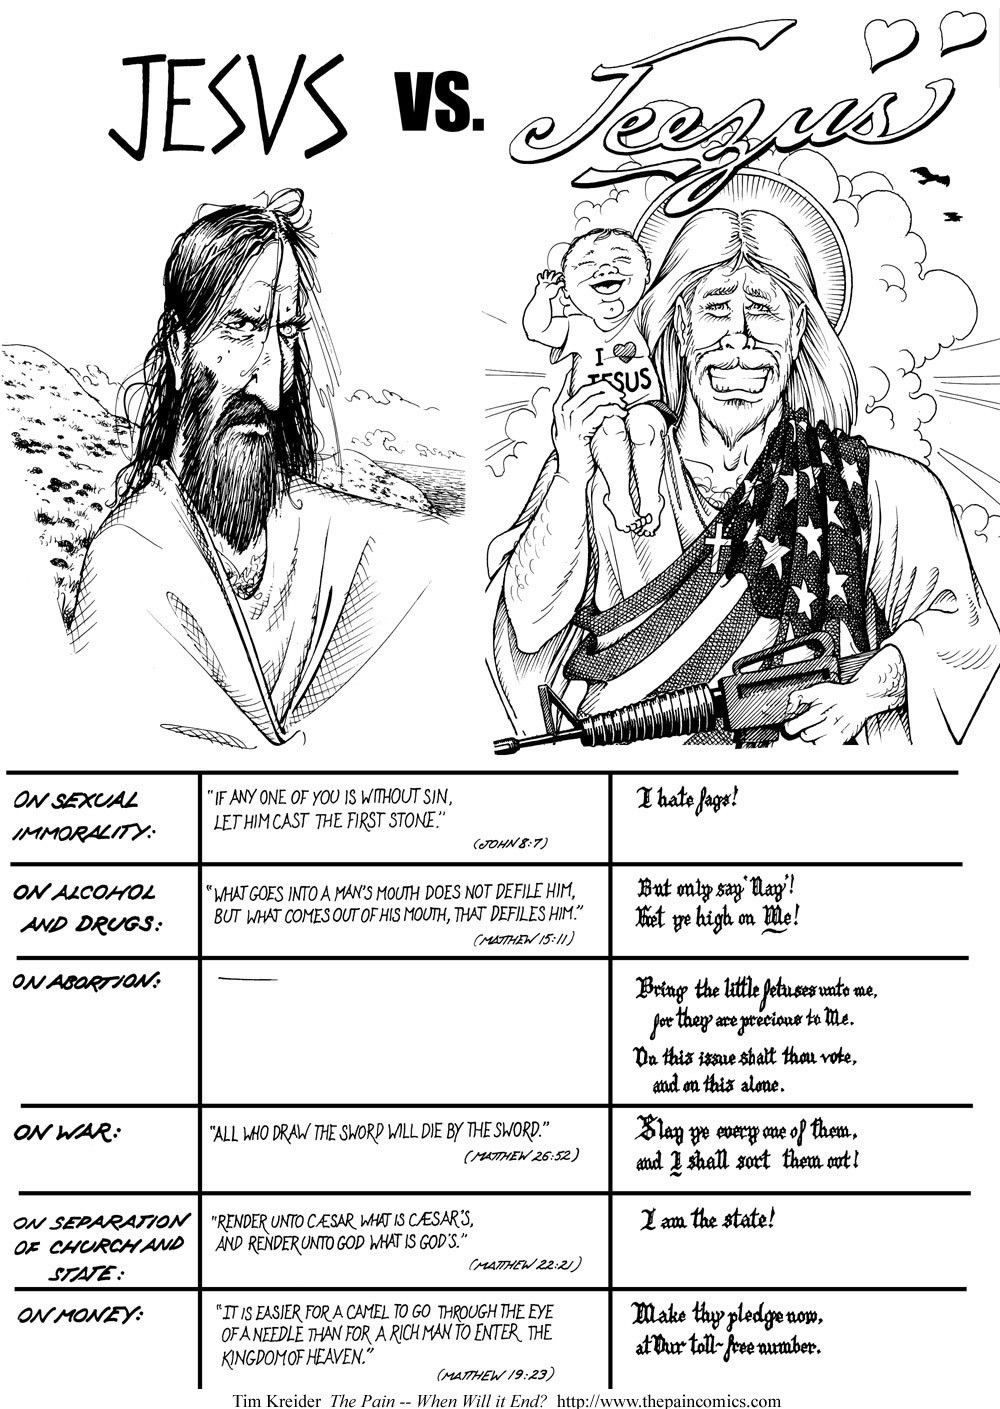 Real Jesus vs FUCK YEAH JESUS